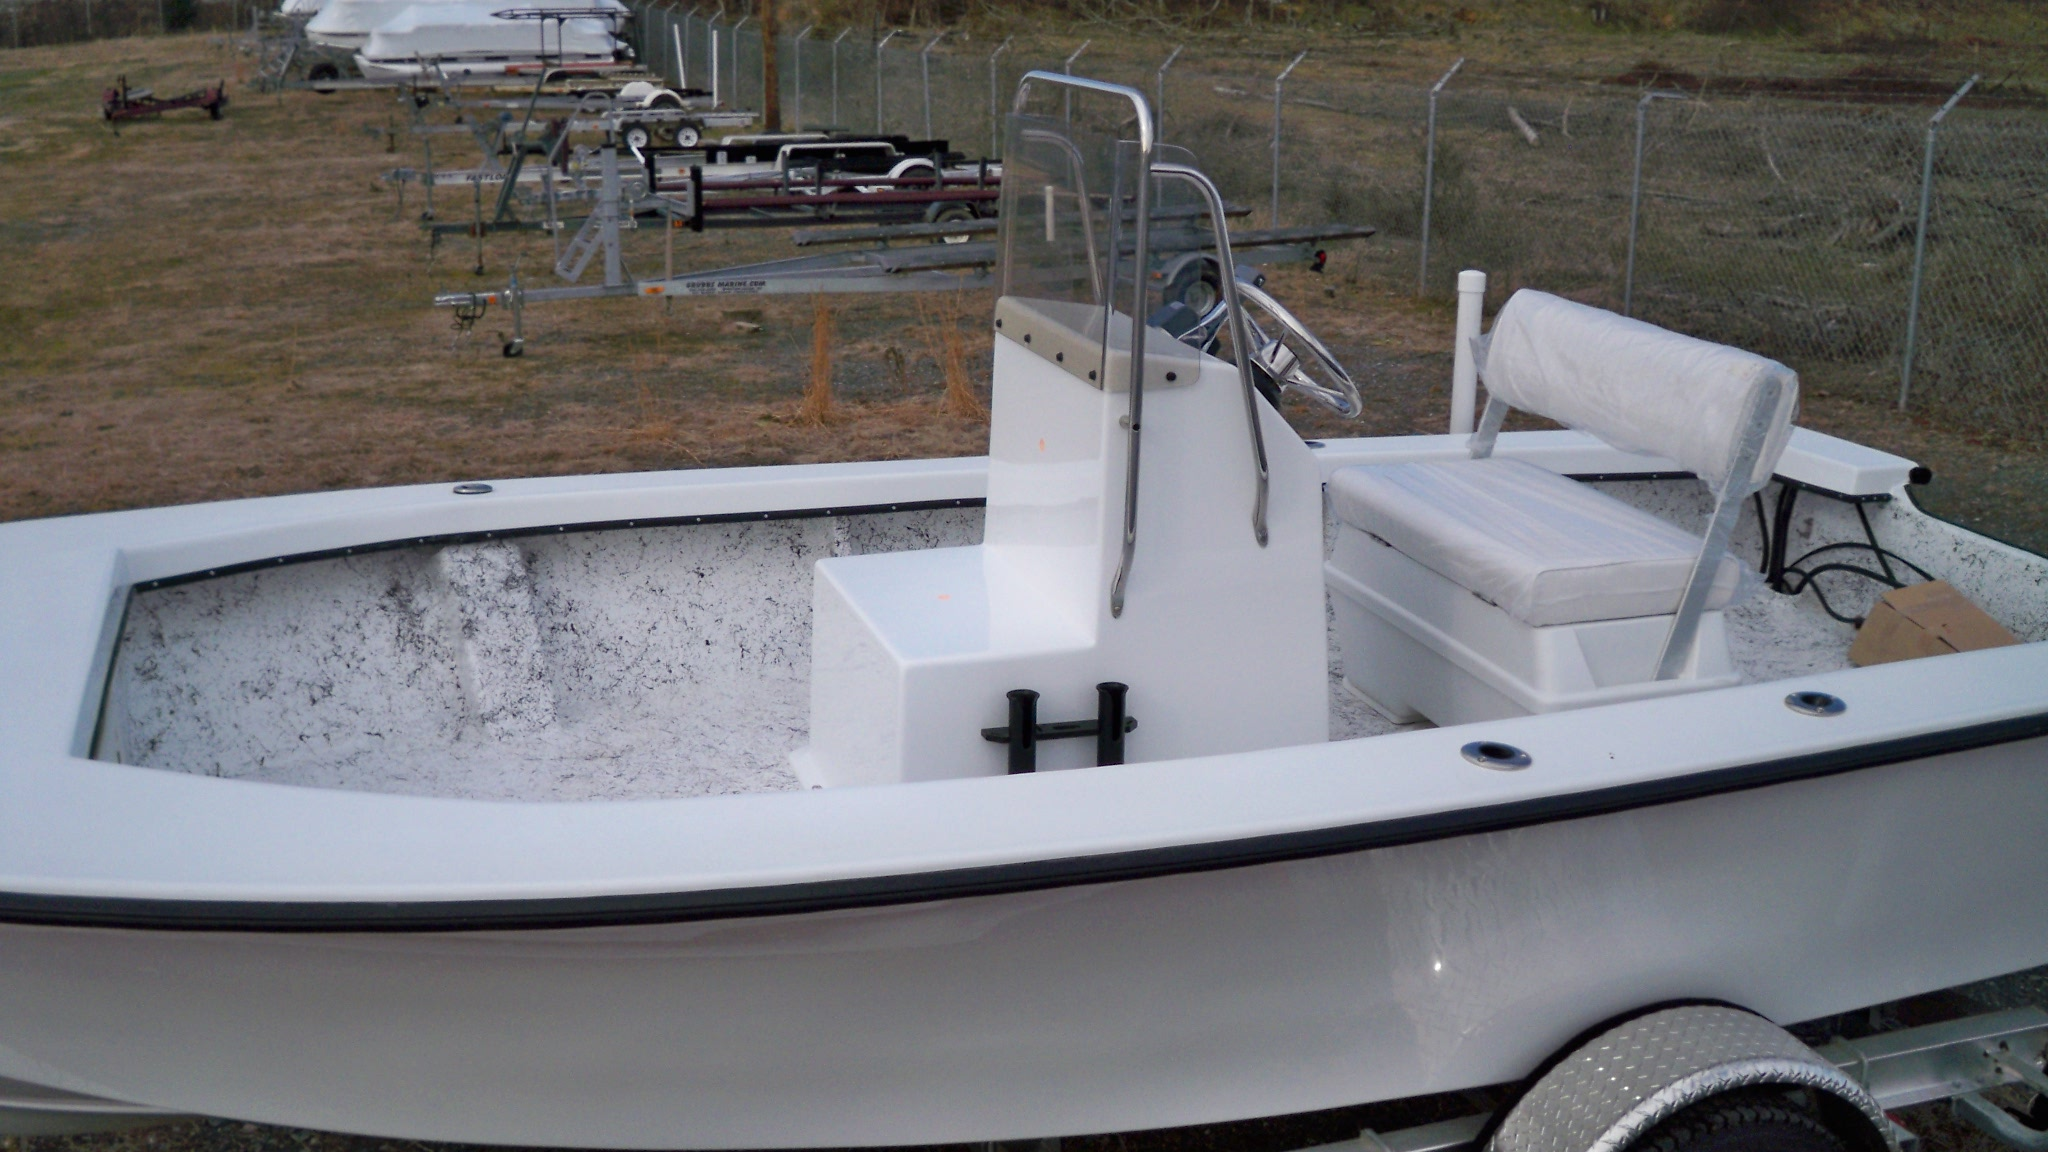 1997 Stratos 282 Wiring Diagram Auto Electrical Elixir Converter Vip Boat